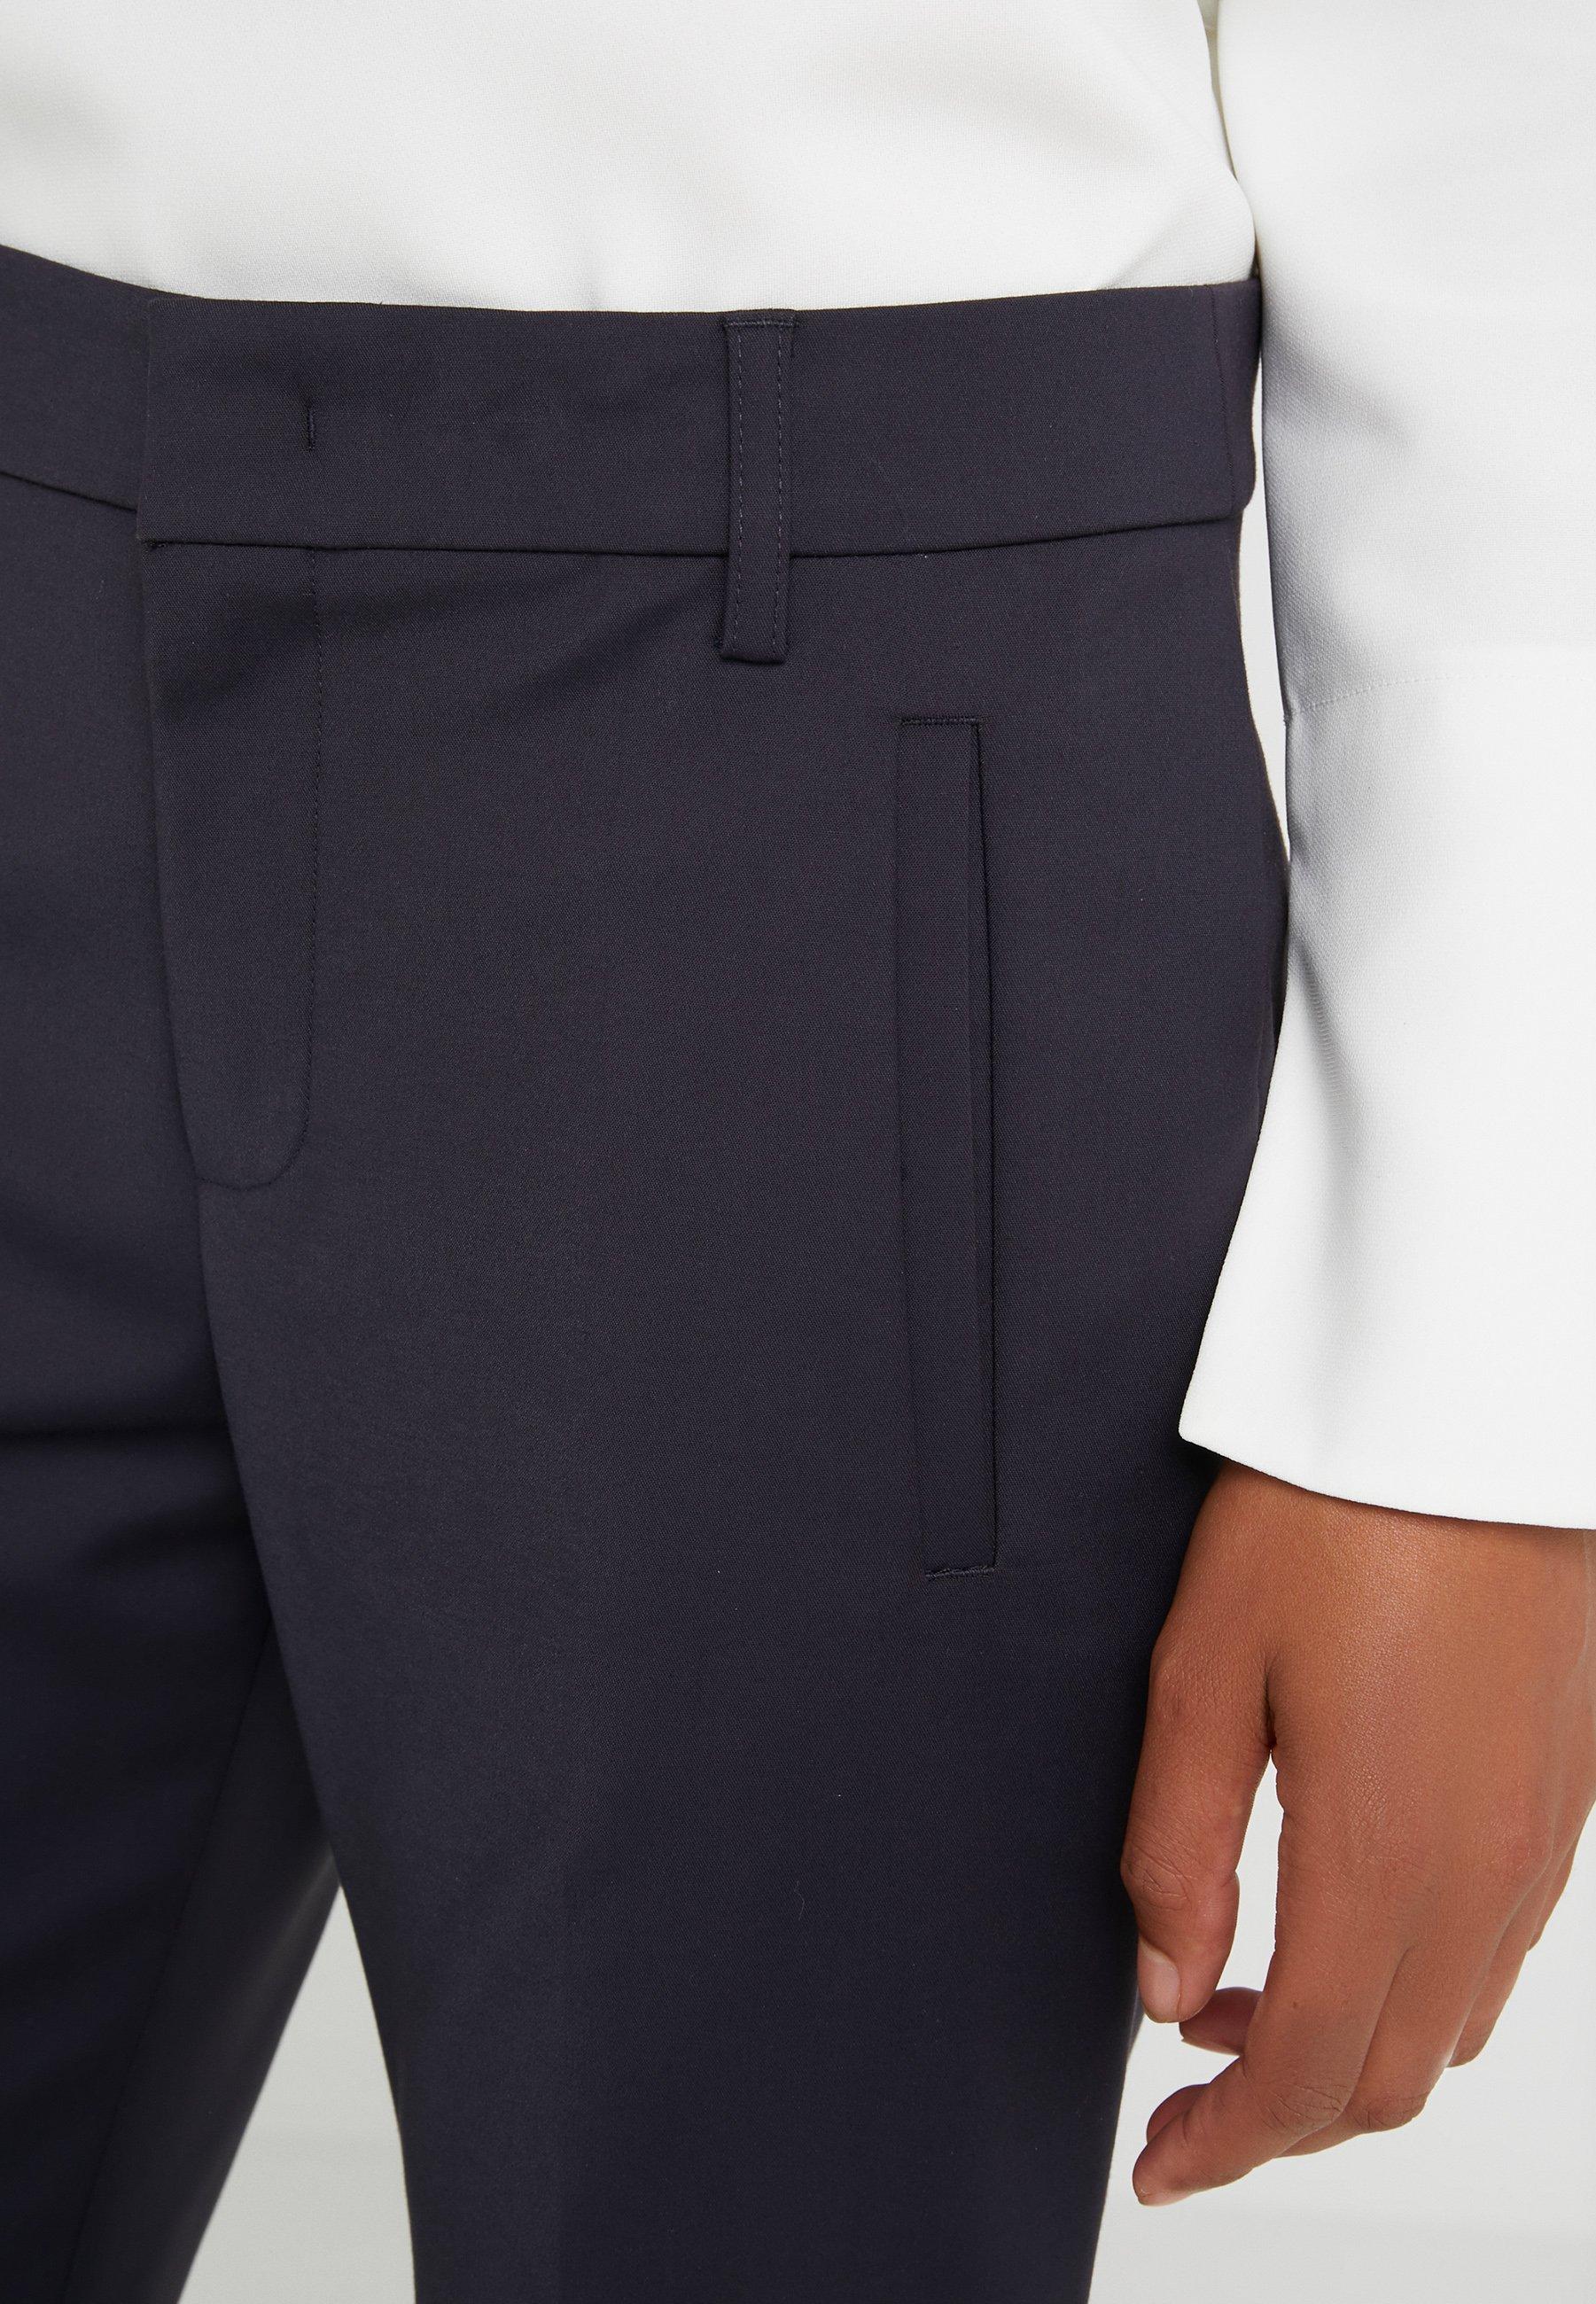 Strenesse Strenesse PariePantalon Pants Navy Pants Classique PariePantalon 1KcJl3TF